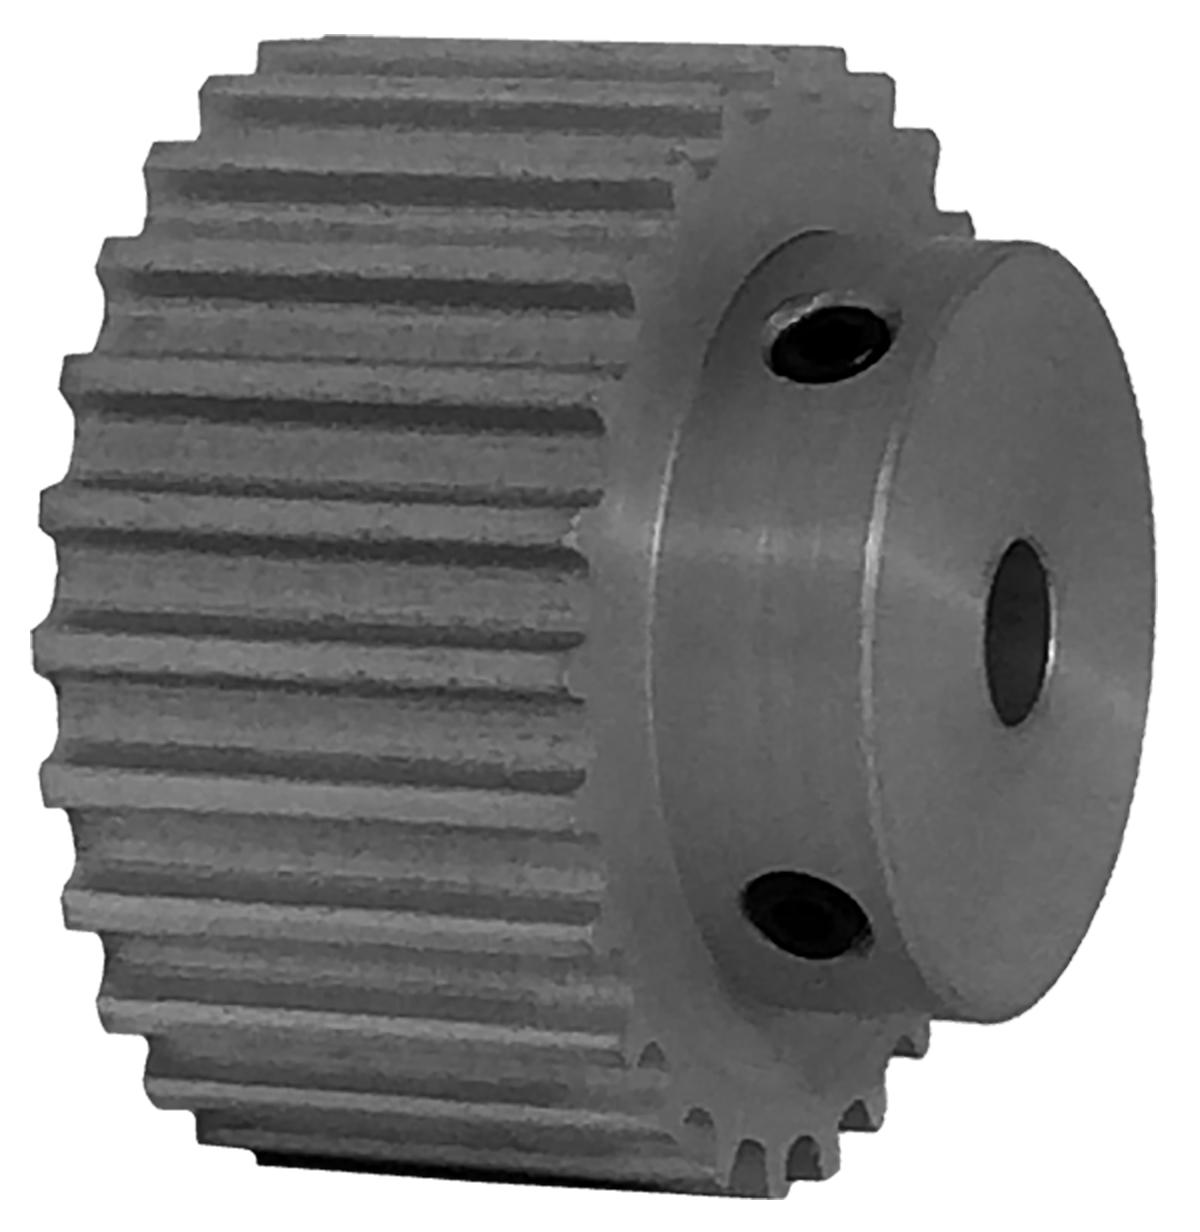 26-5M15-6A3 - Aluminum Powerhouse®HTD® Pulleys